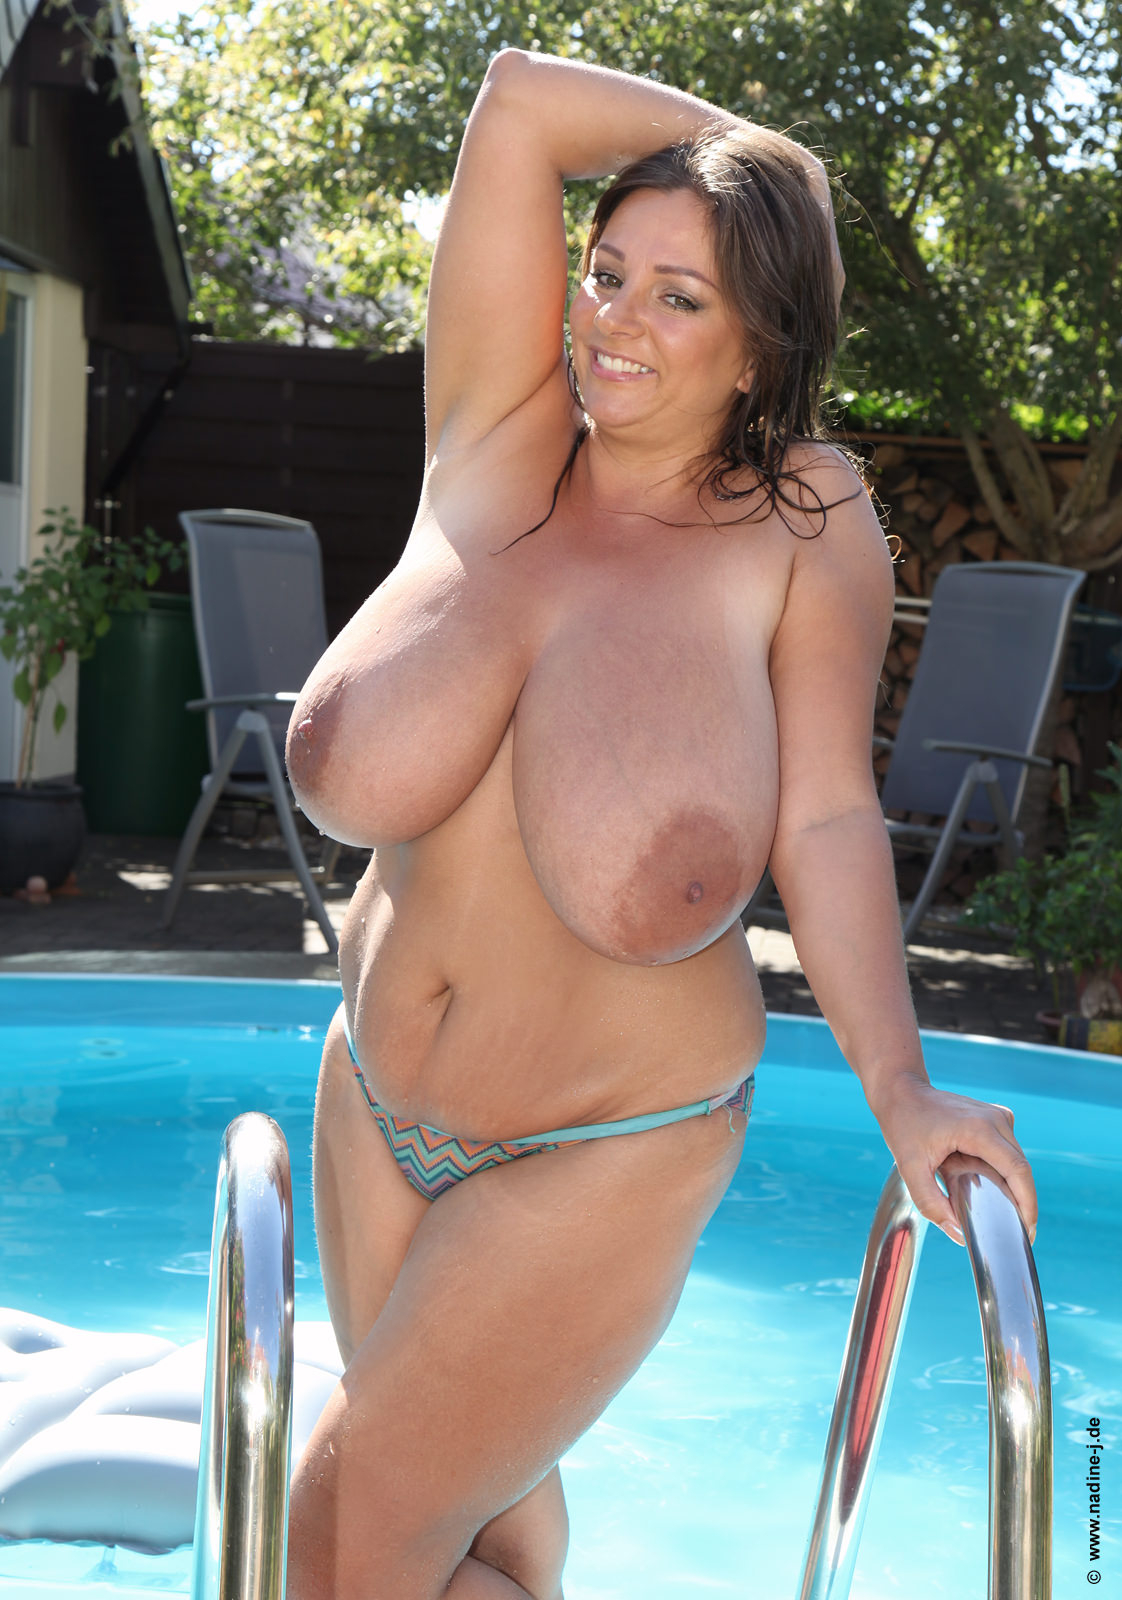 Showing images for nadine jansen bikini xxx